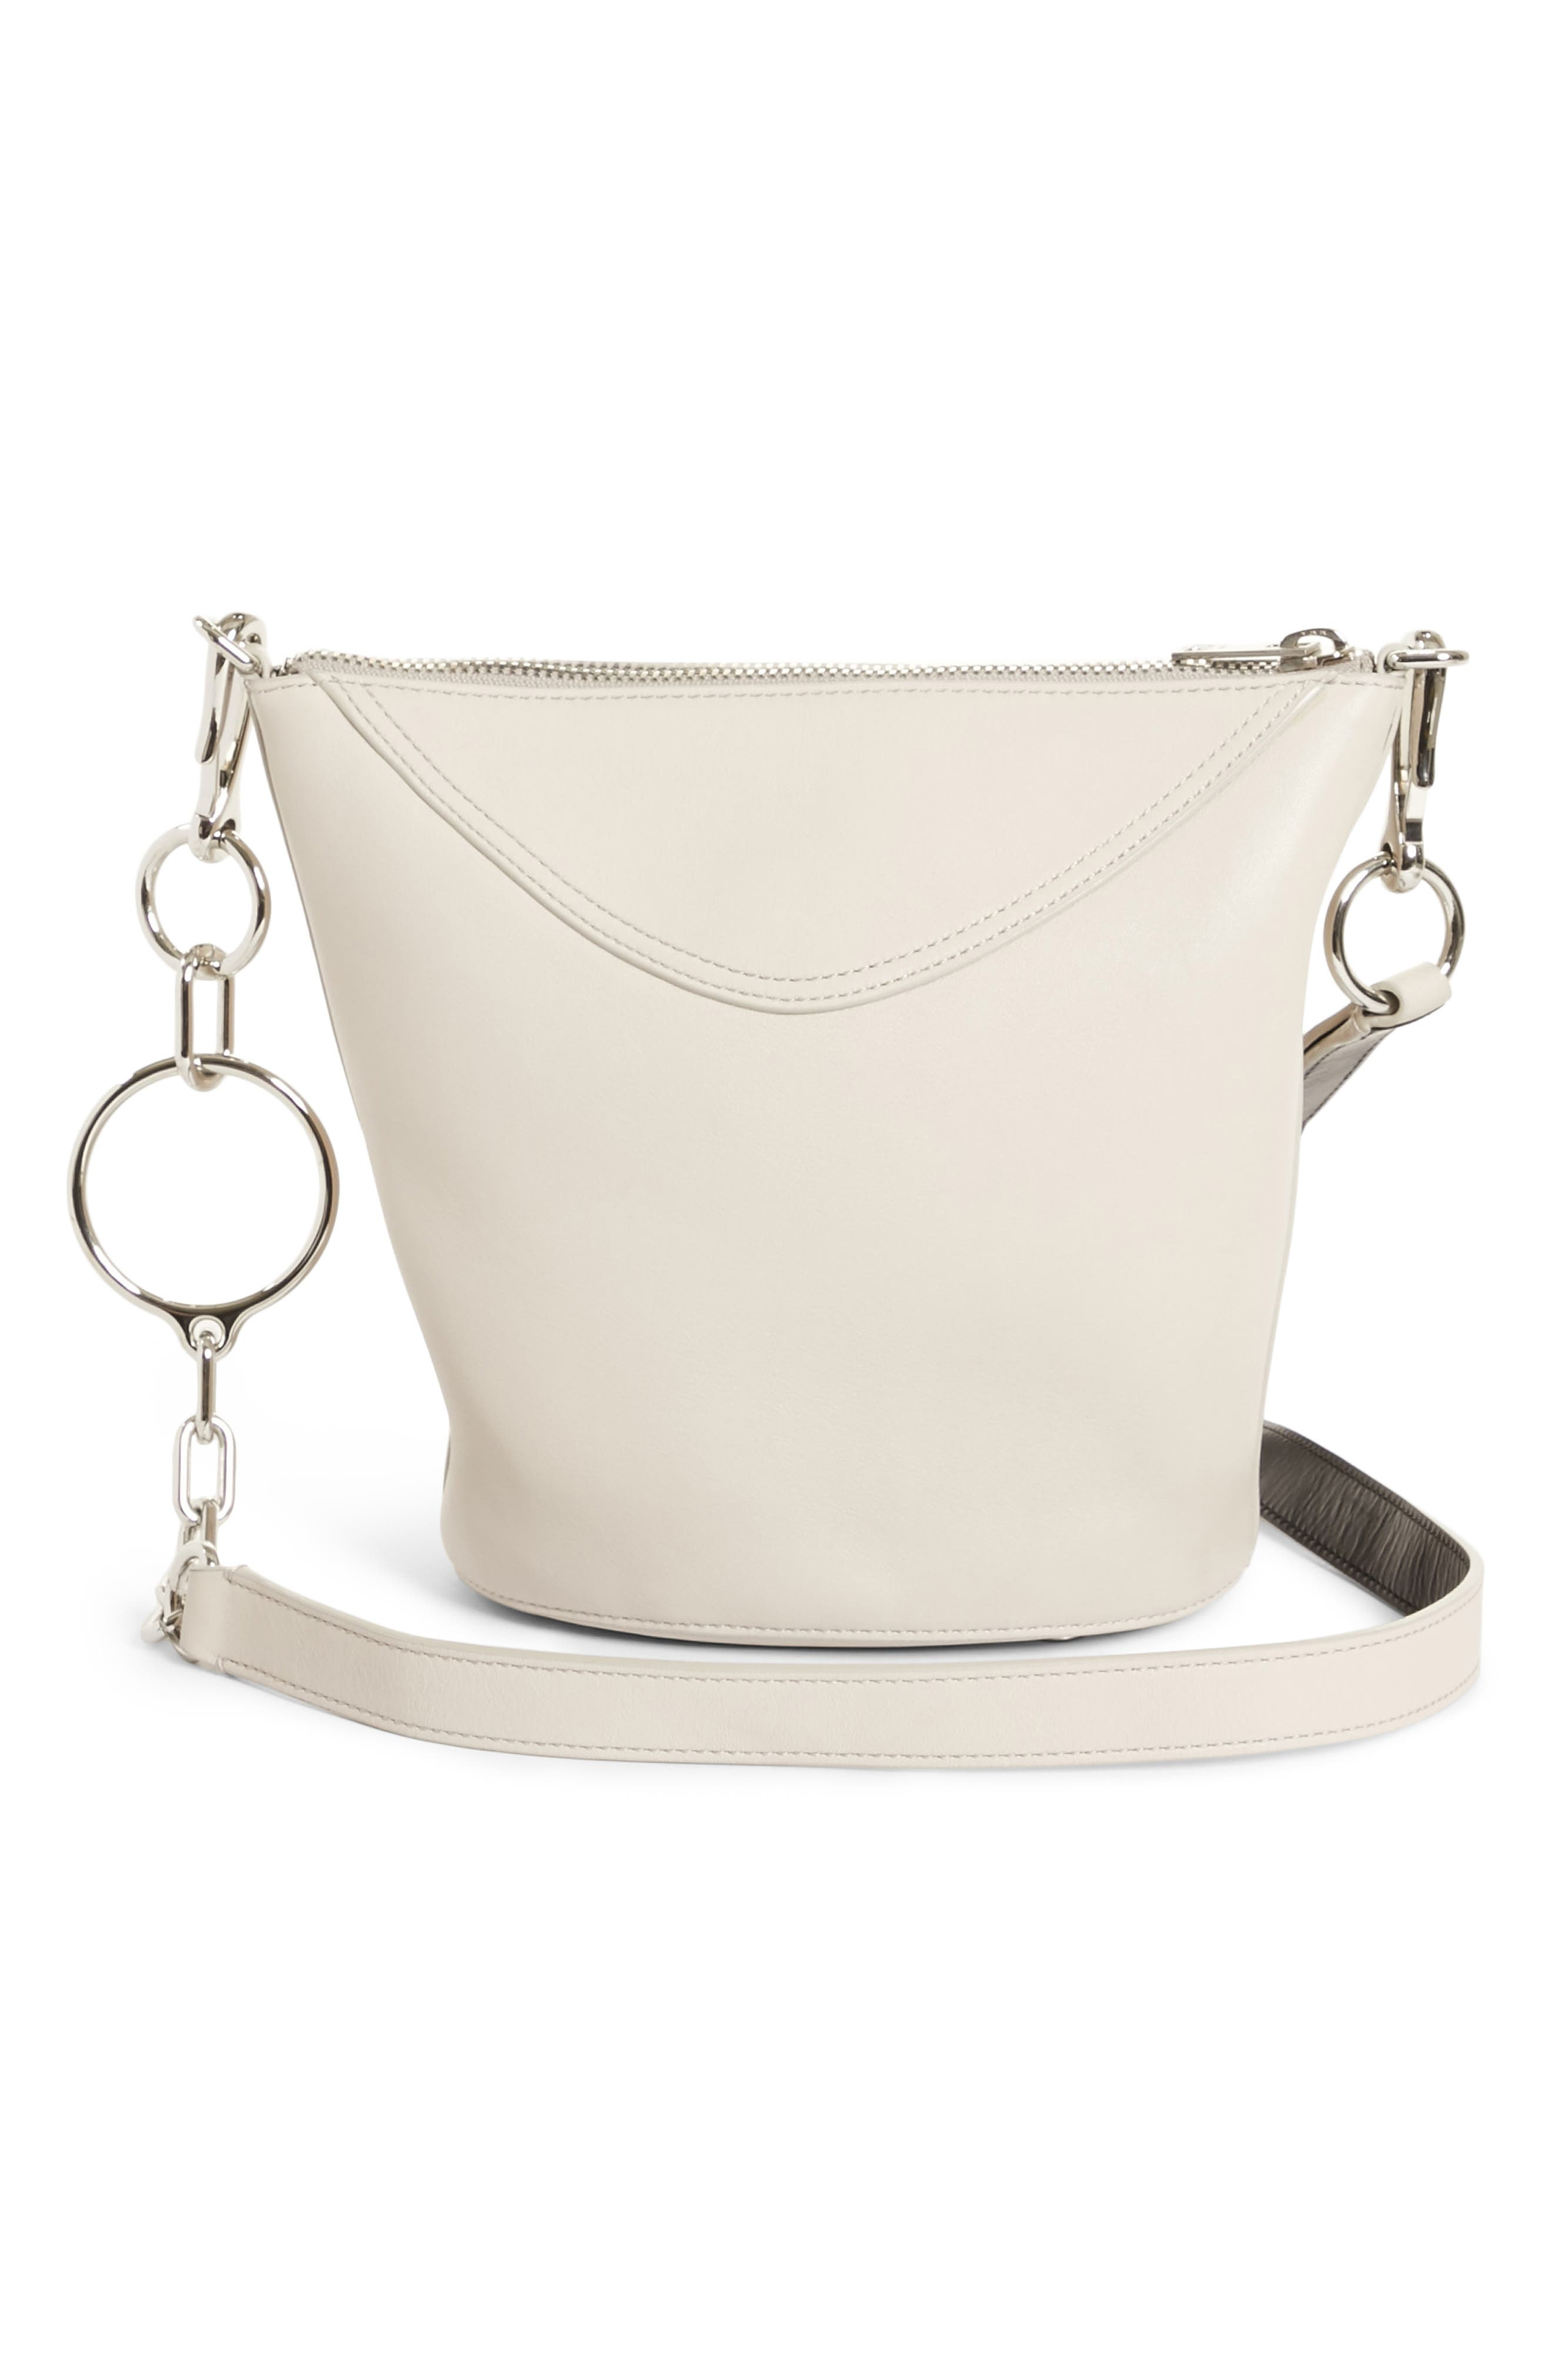 Ace Leather Bucket Bag,                             Main thumbnail 1, color,                             021